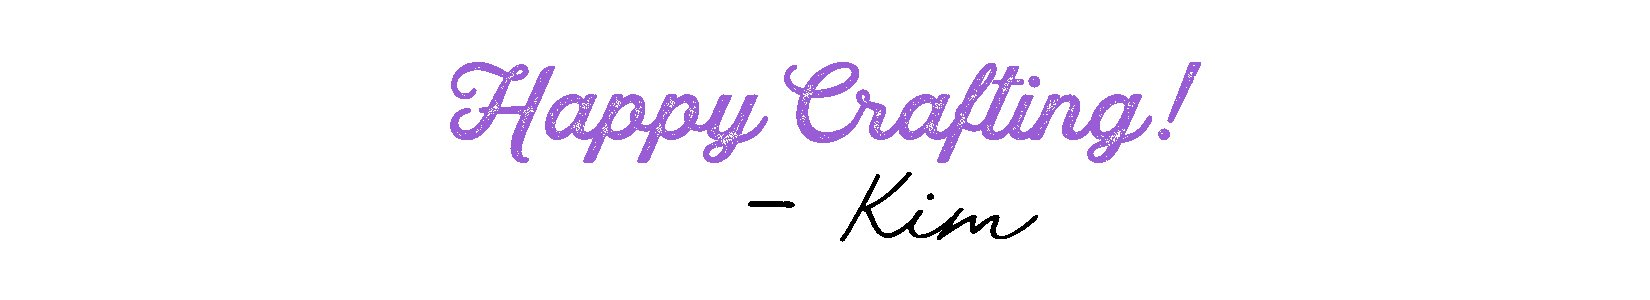 Happy Crafting! -Kim